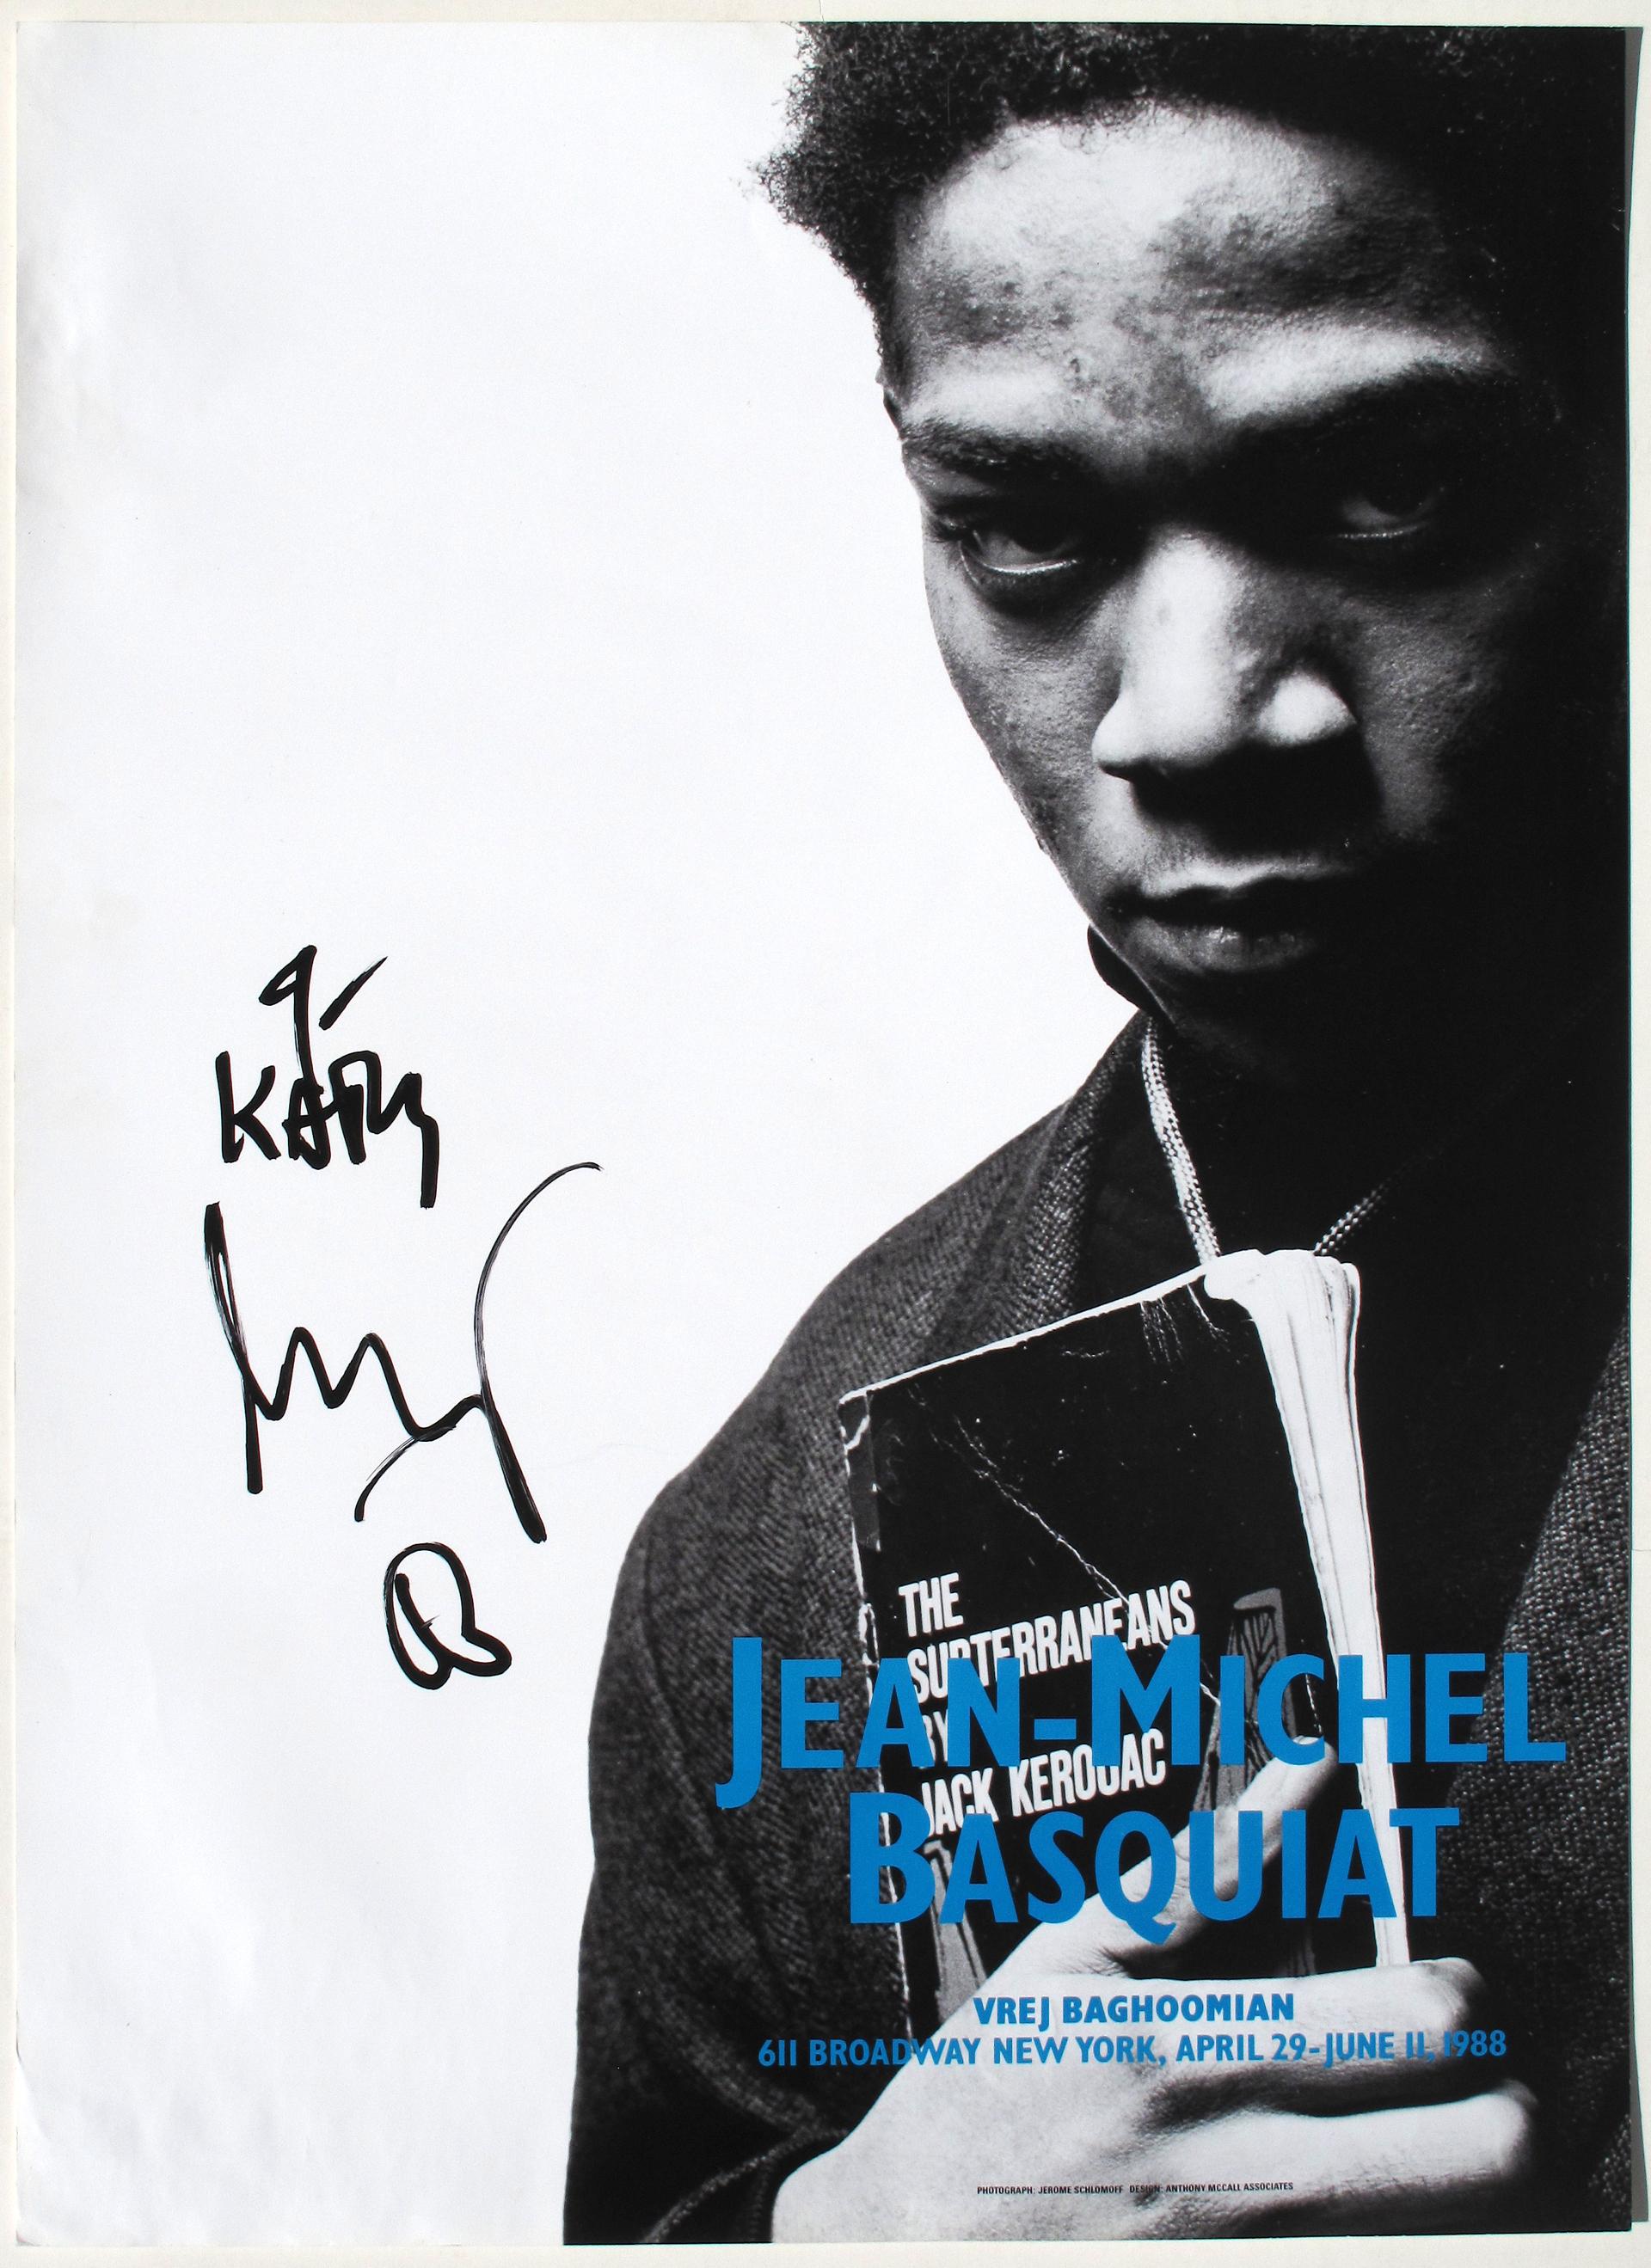 Portrait with Jack Kerouac by Jean-Michel Basquiat